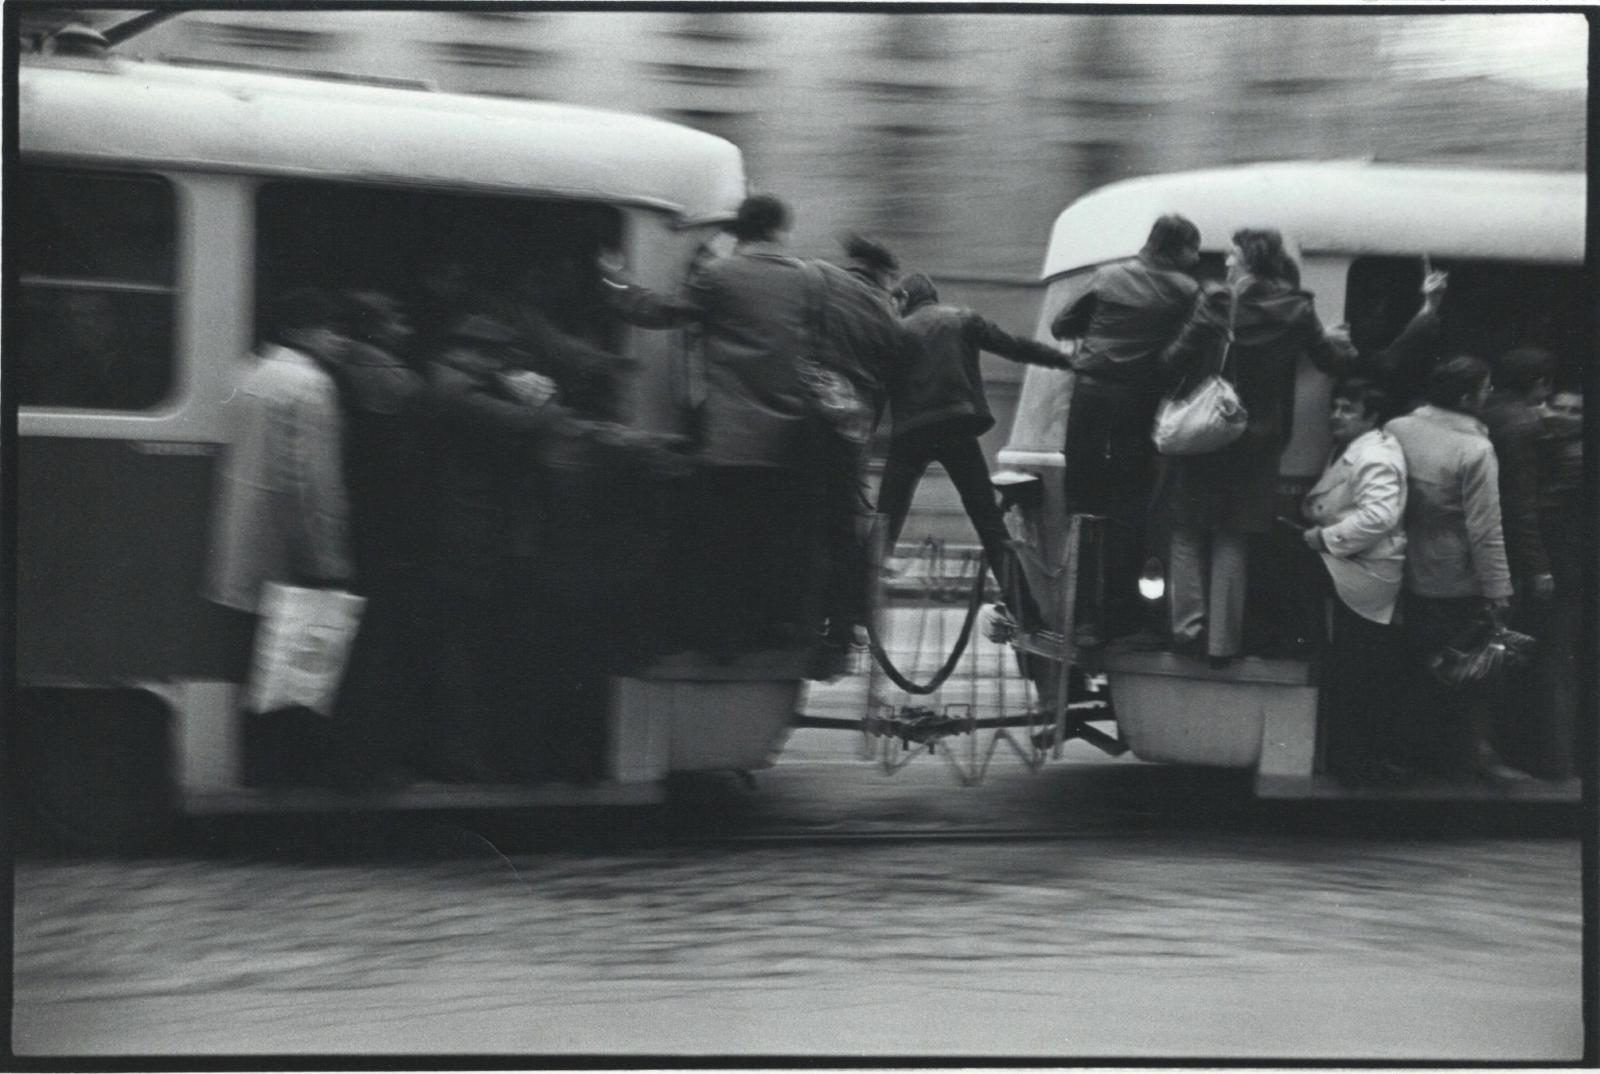 Andrei Pandele, Acrobatie entre tramways, 1983, photographie. Courtesy Ovidiu Sandor Collection